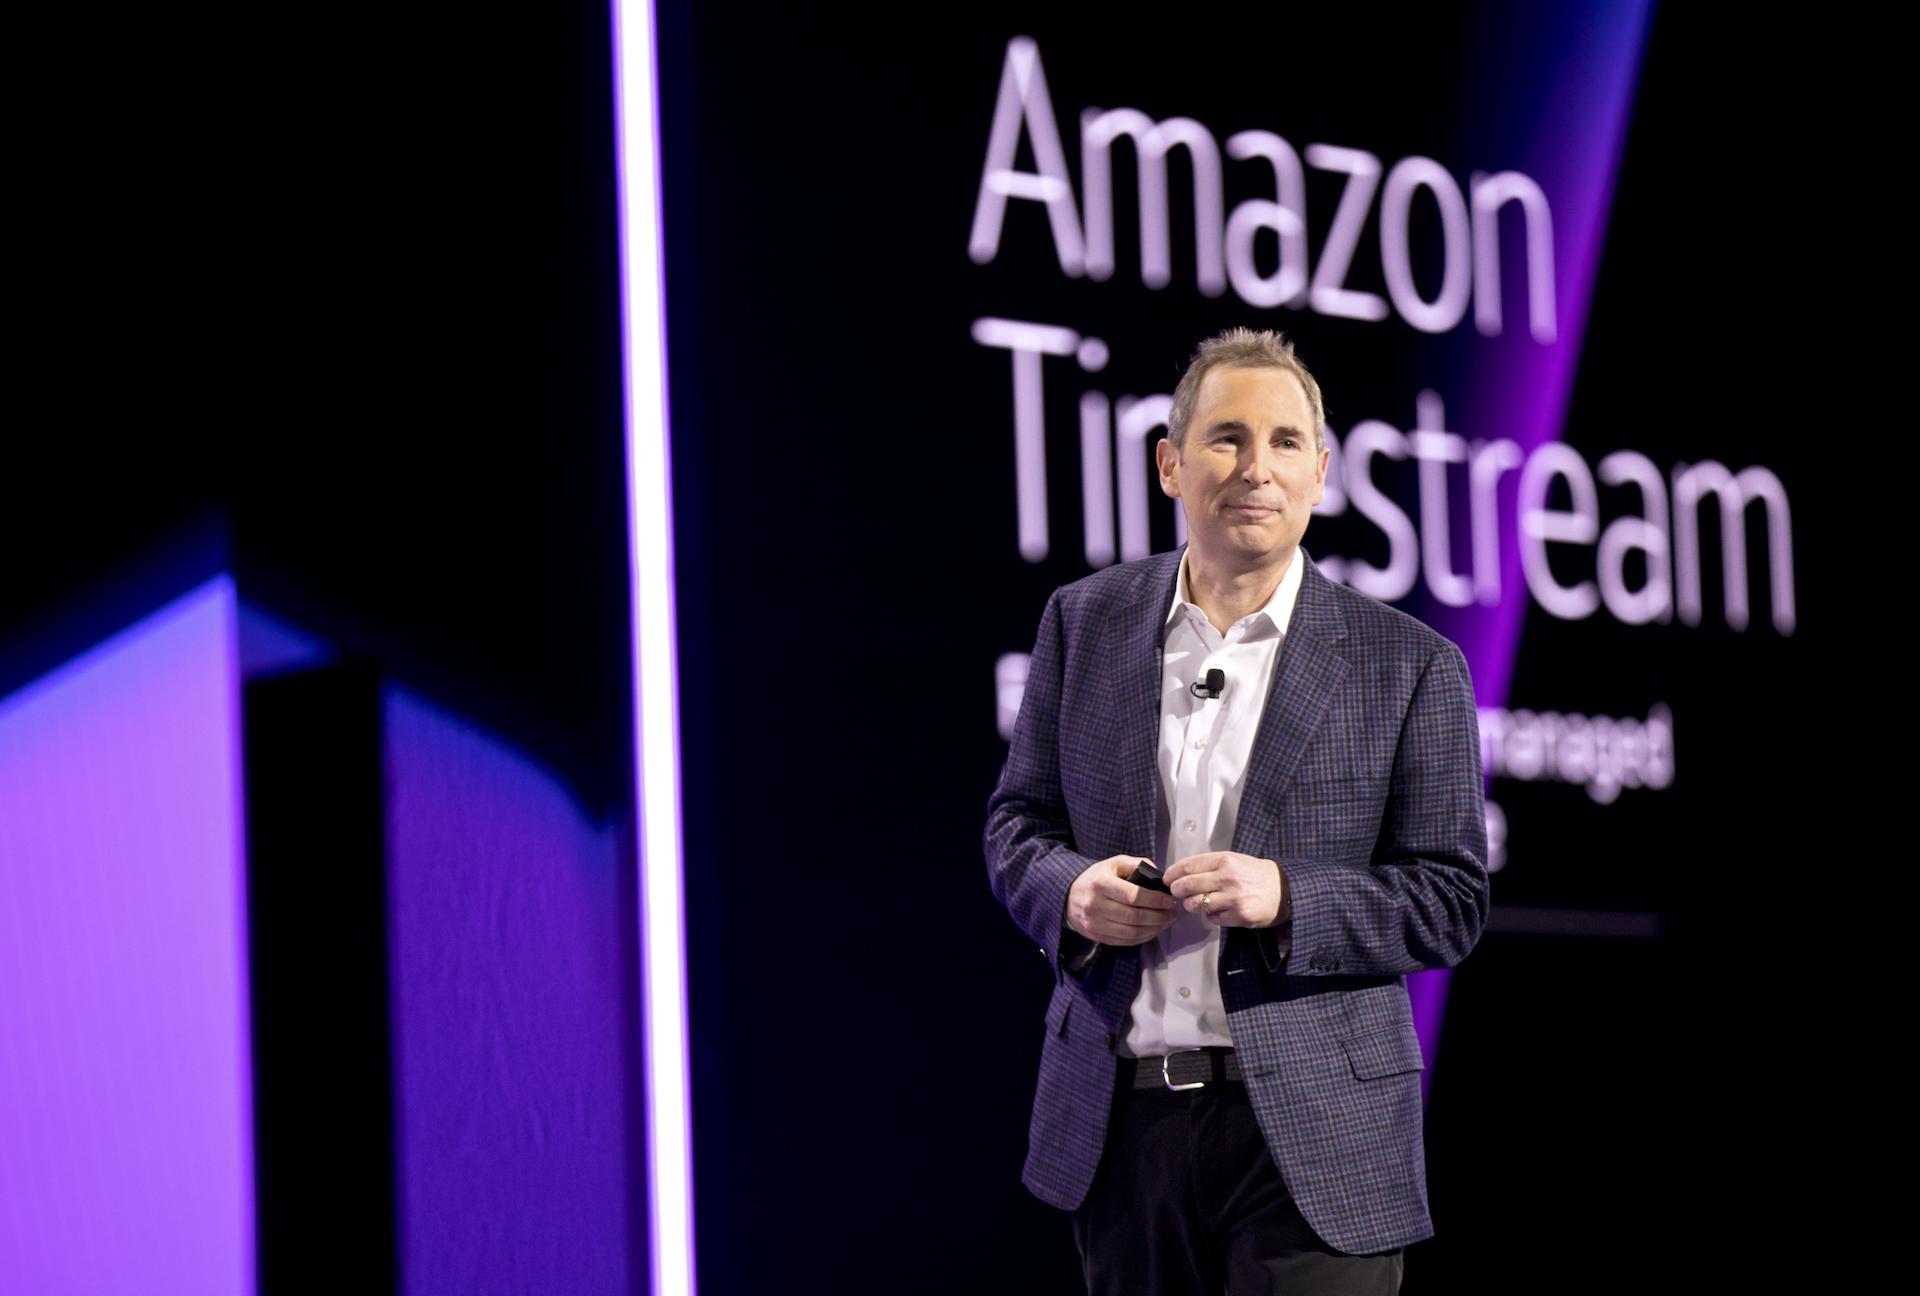 Andy Jassy Keynote at AWS at The Venetian, Las Vegas, NV on Wednesday, Nov. 28, 2018.